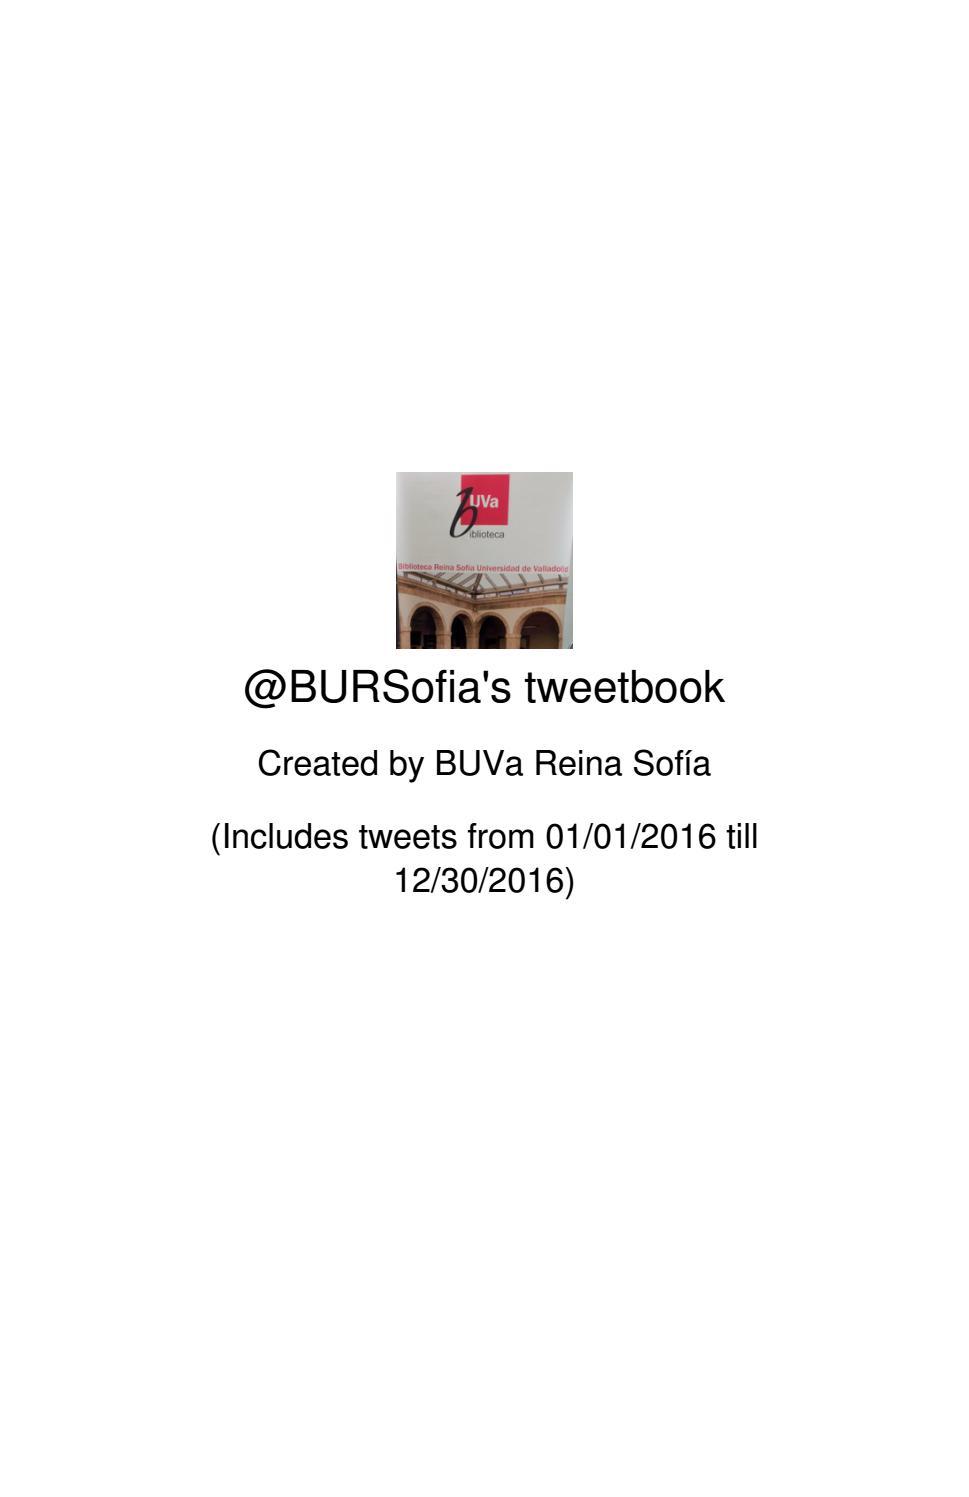 Convertidor De Letras Cursivas Para Tatuajes twitter 2016bursofia biblioteca general uva - issuu